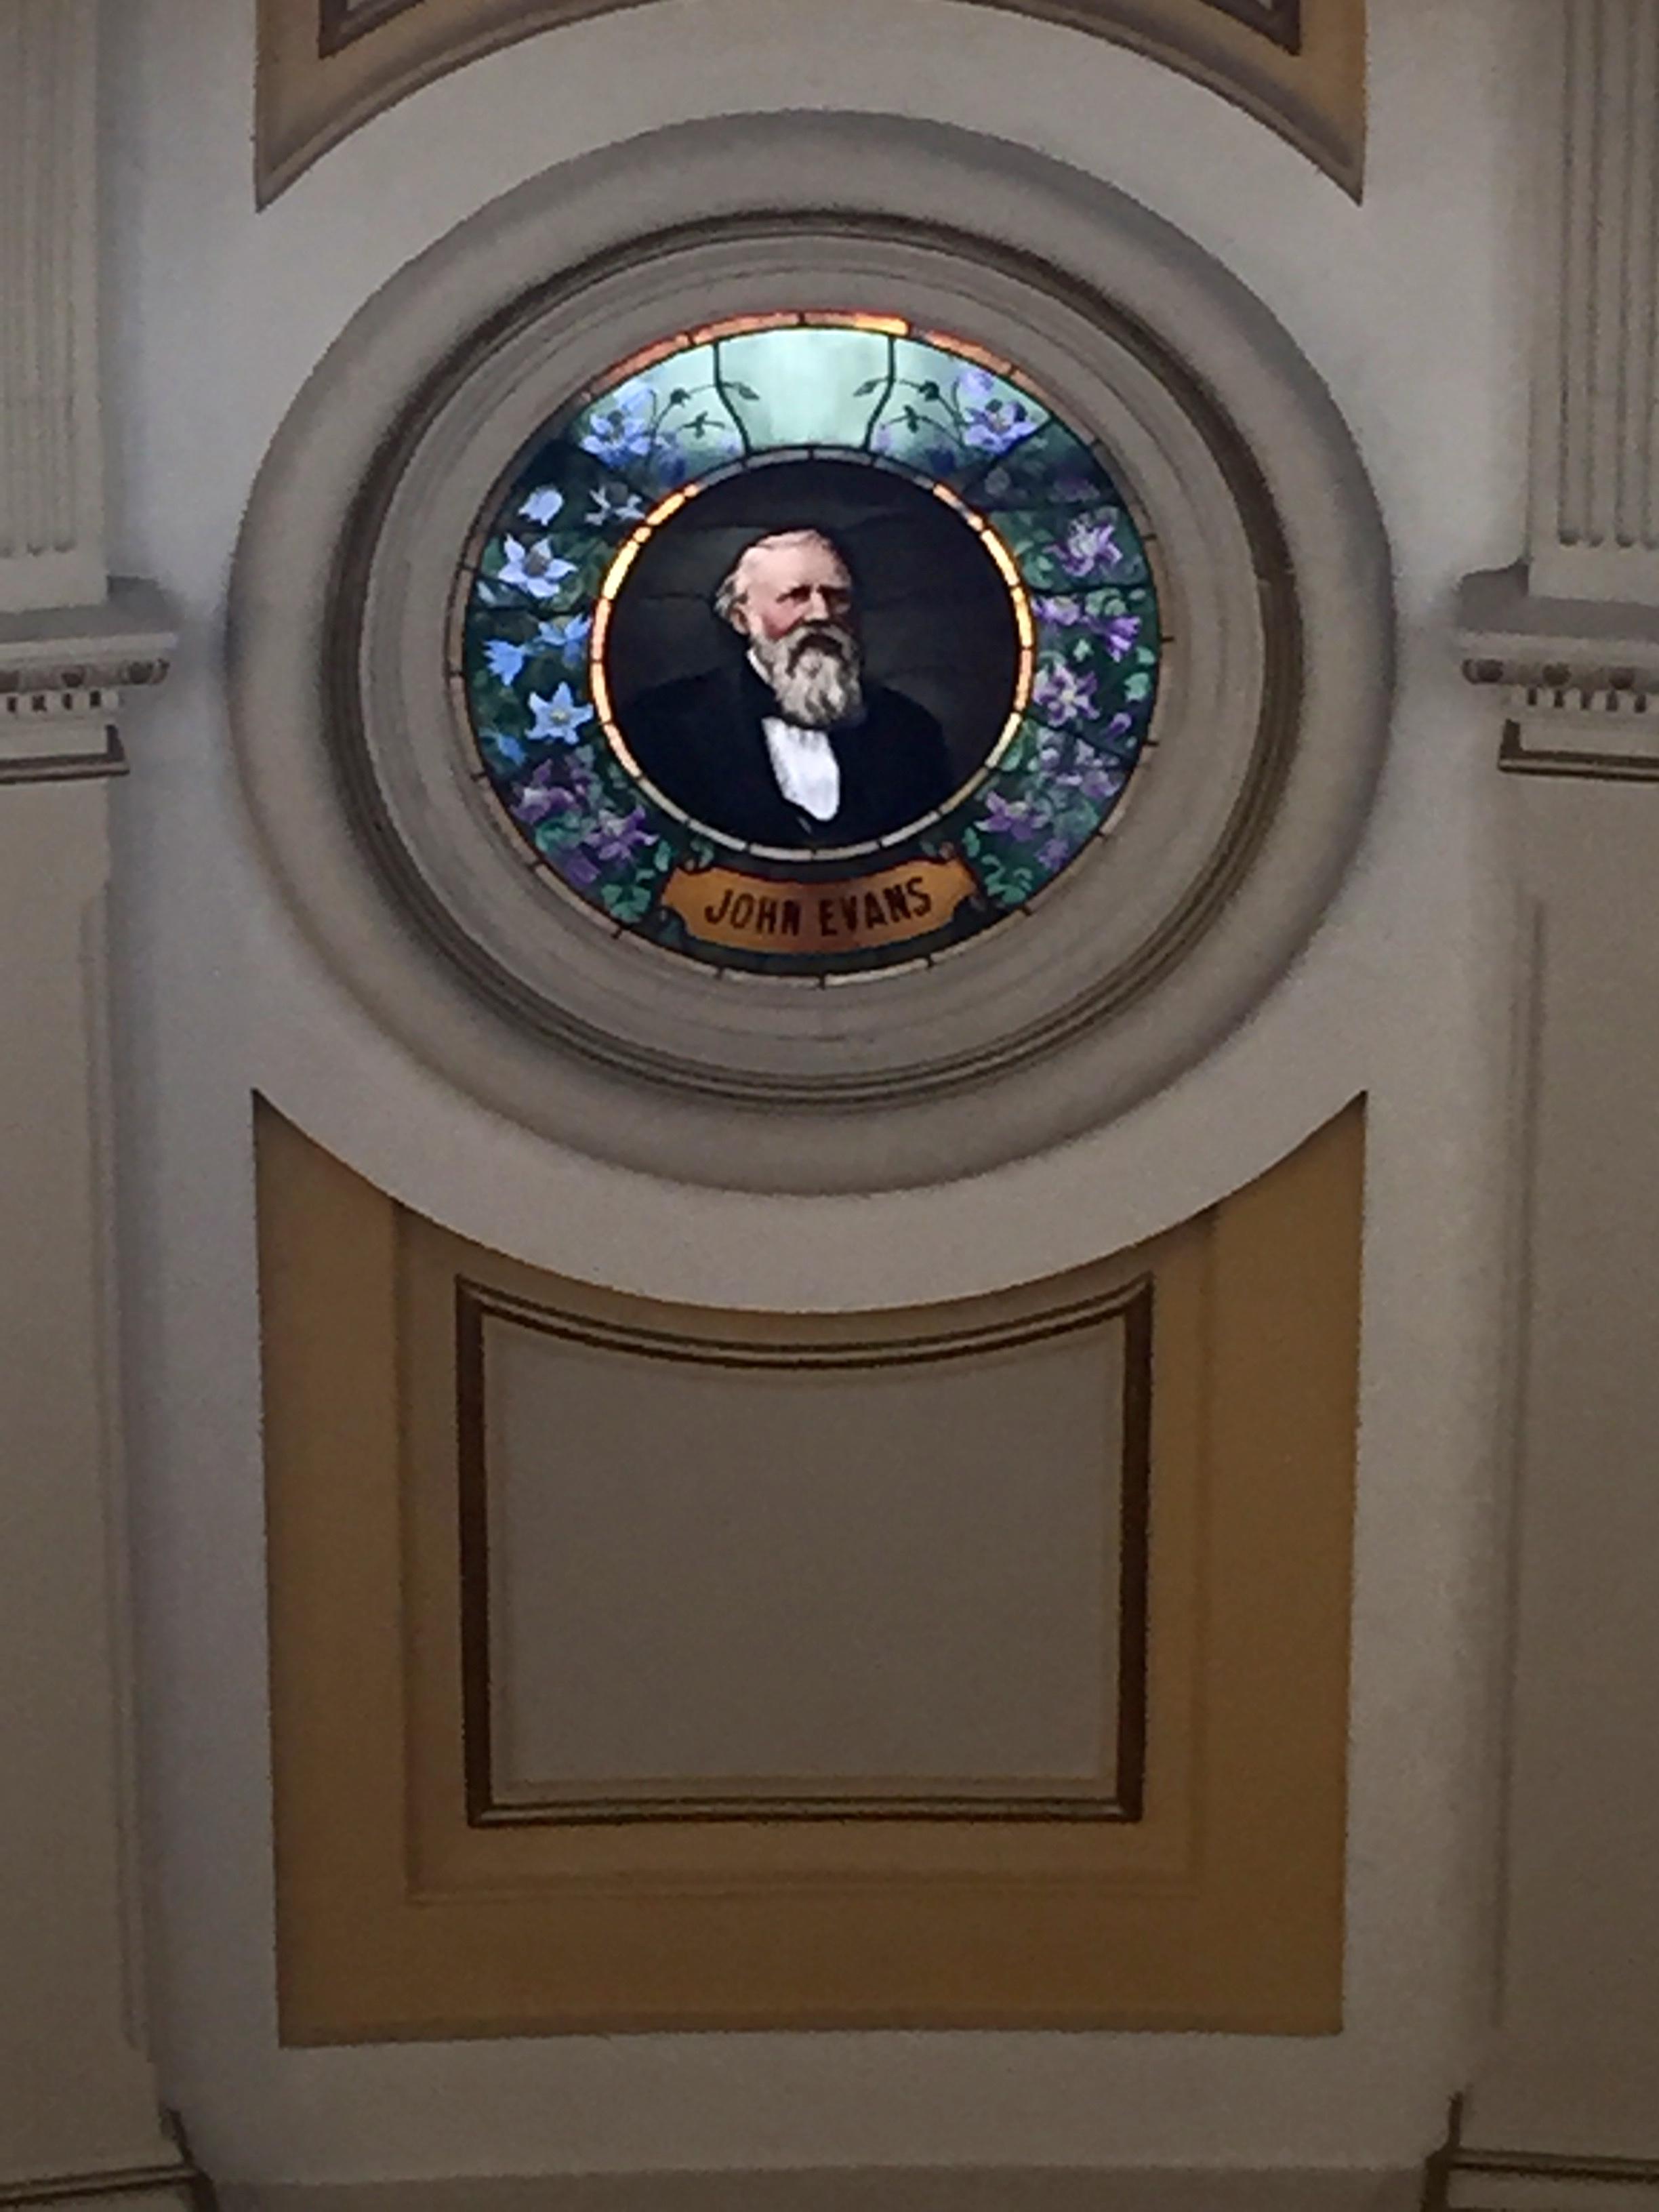 John Evans, early Colorado leader